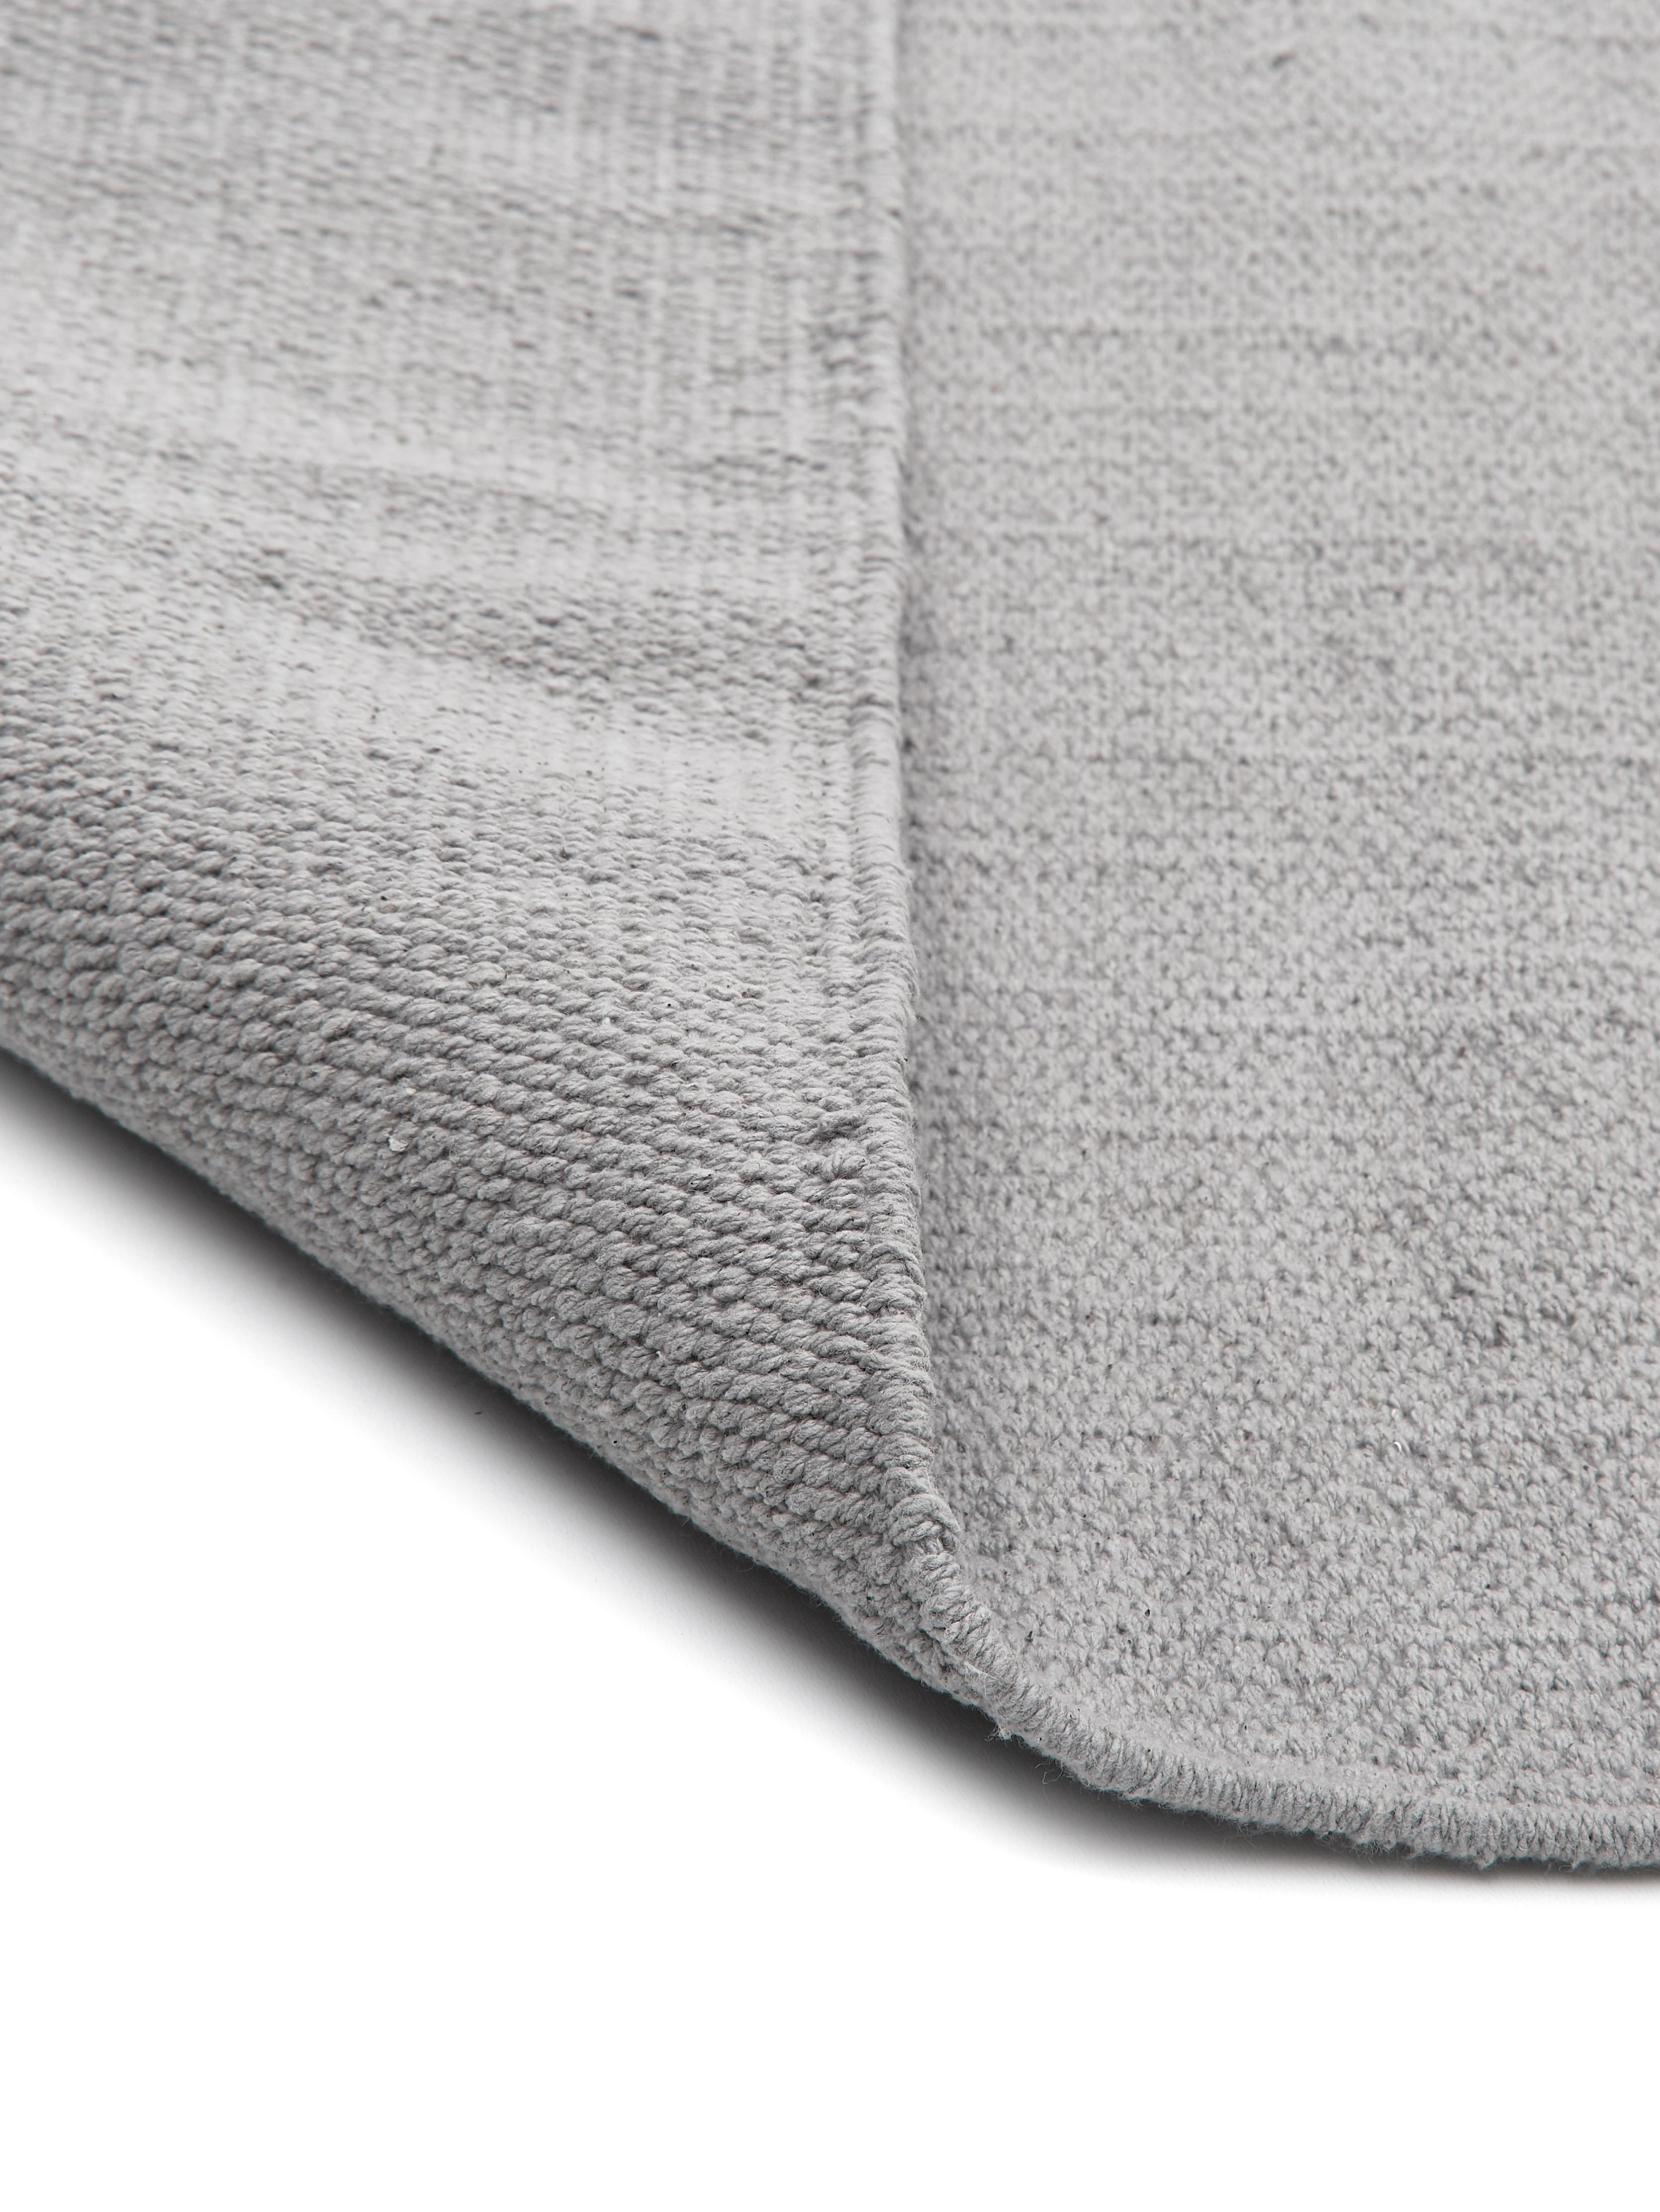 Dünner Baumwollteppich Agneta, handgewebt, 100% Baumwolle, Grau, B 70 x L 140 cm (Grösse XS)